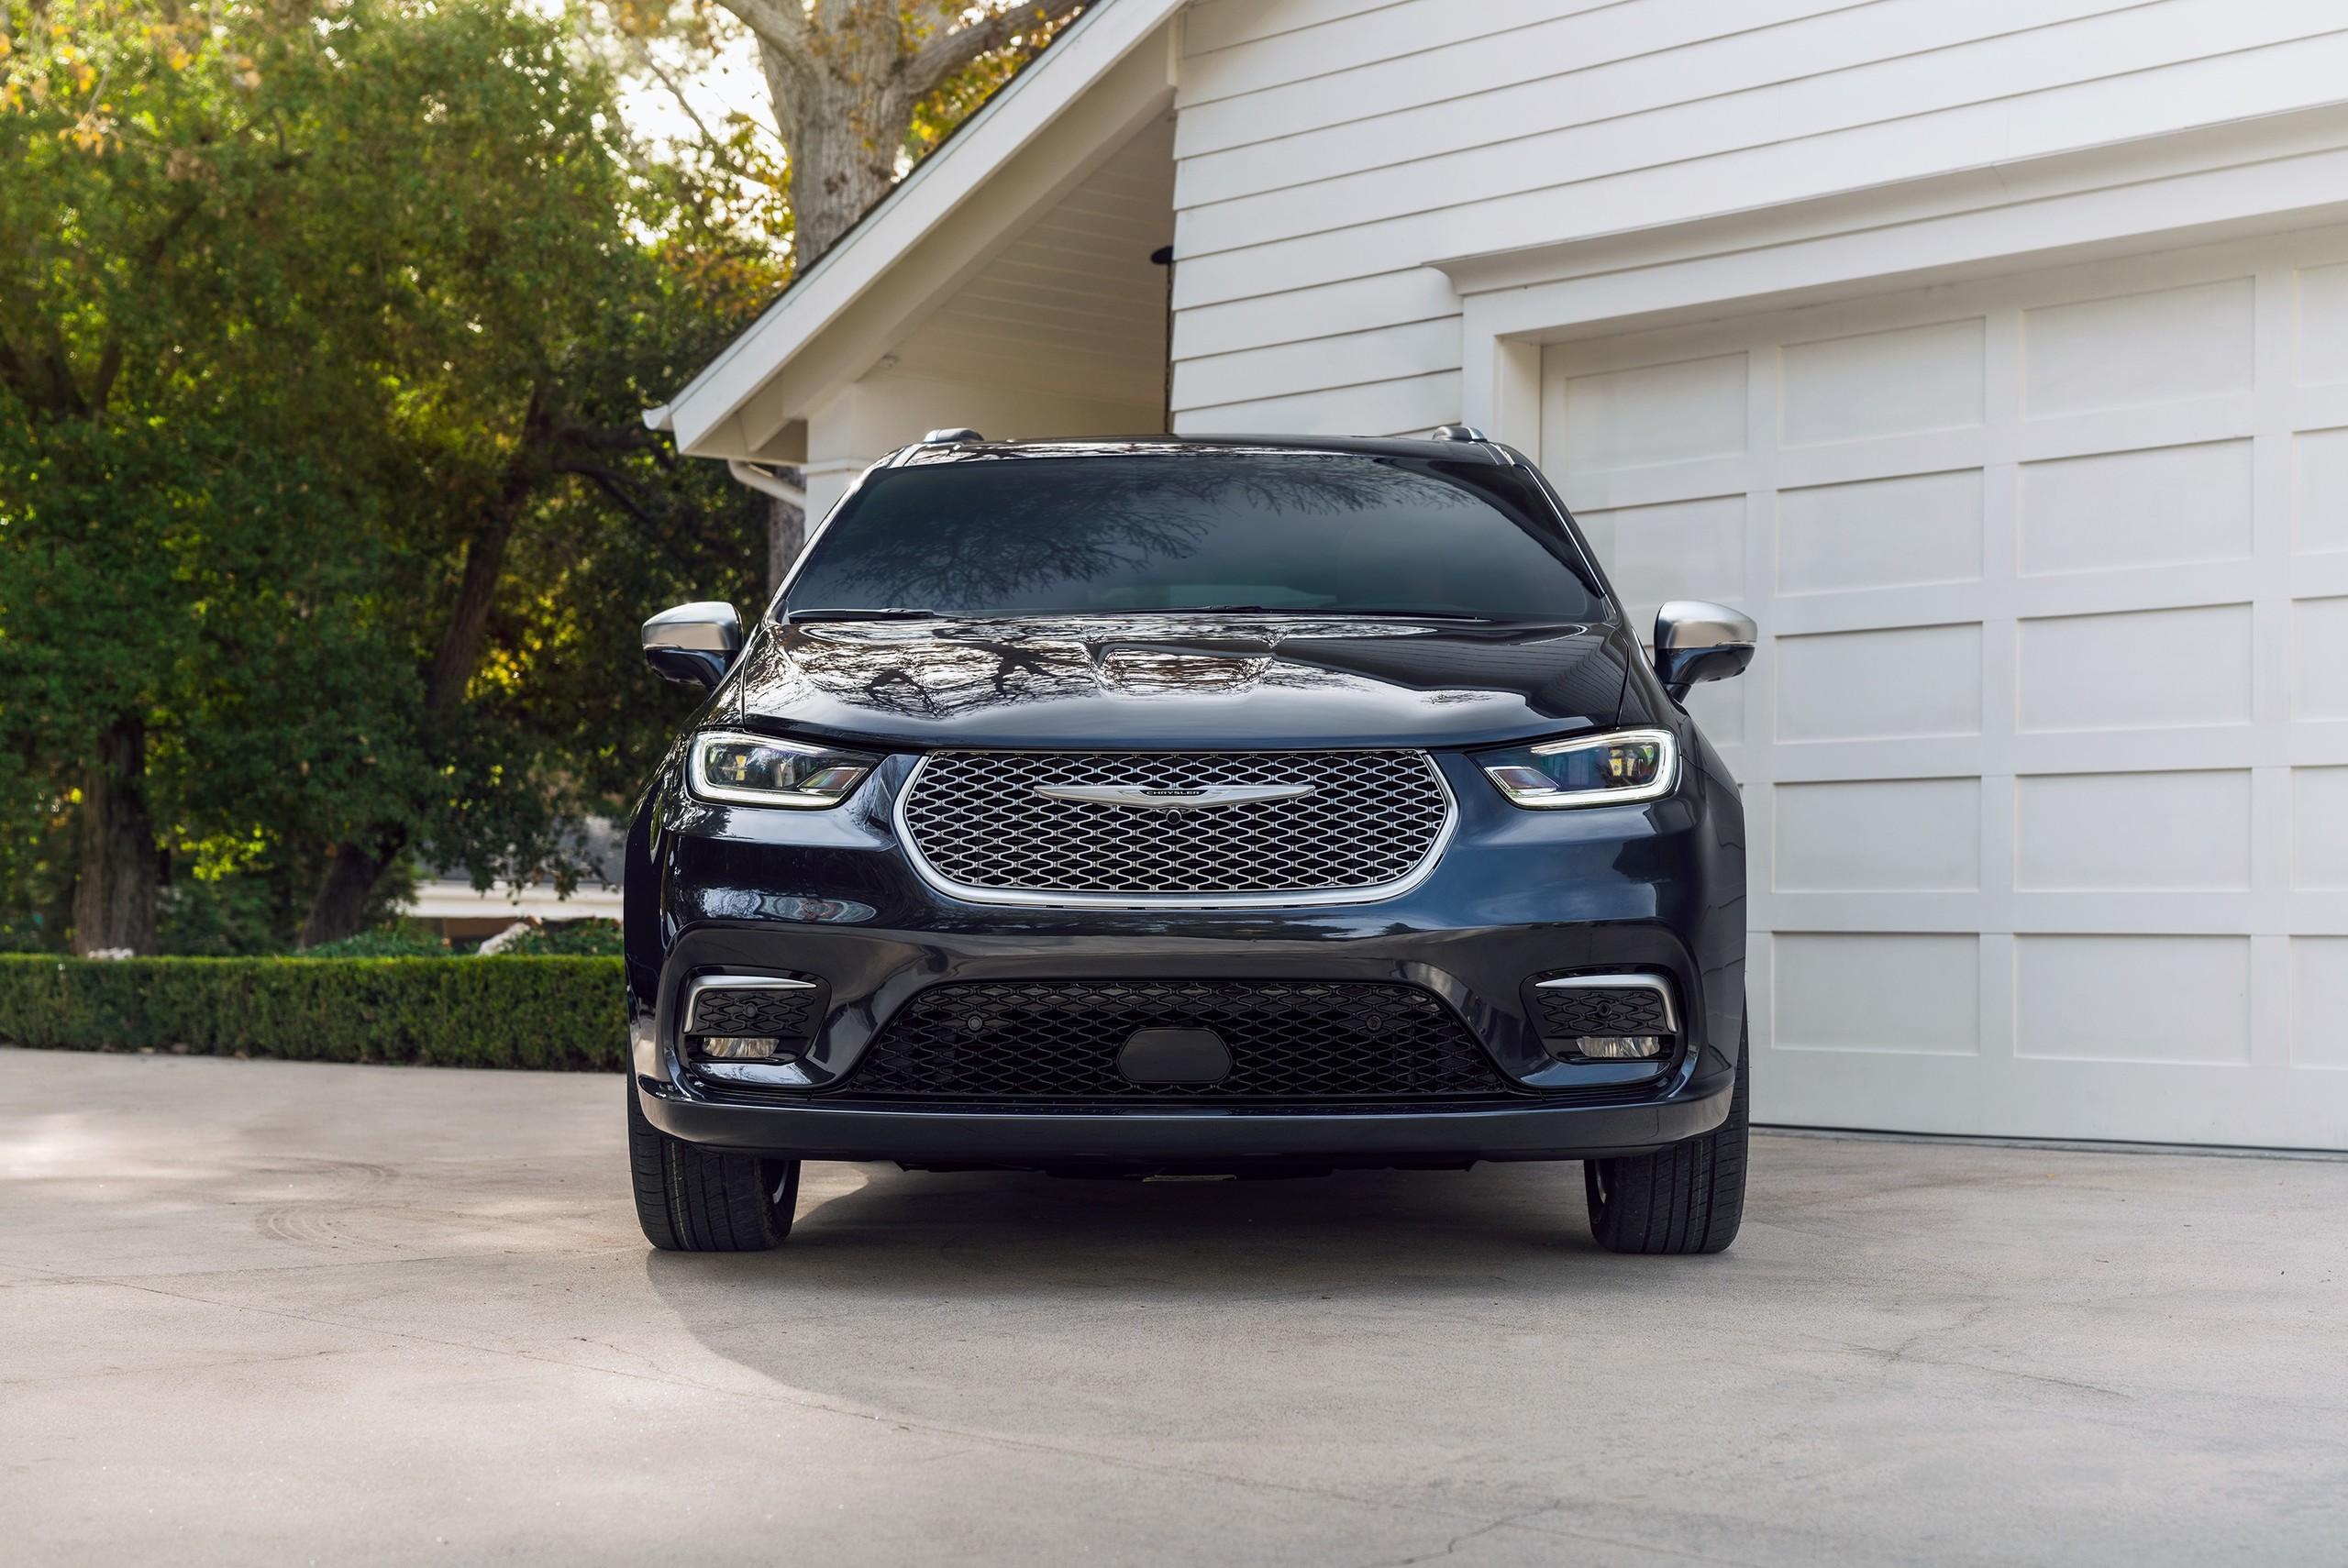 Foto de Chrysler Pacifica 2021 (1/13)